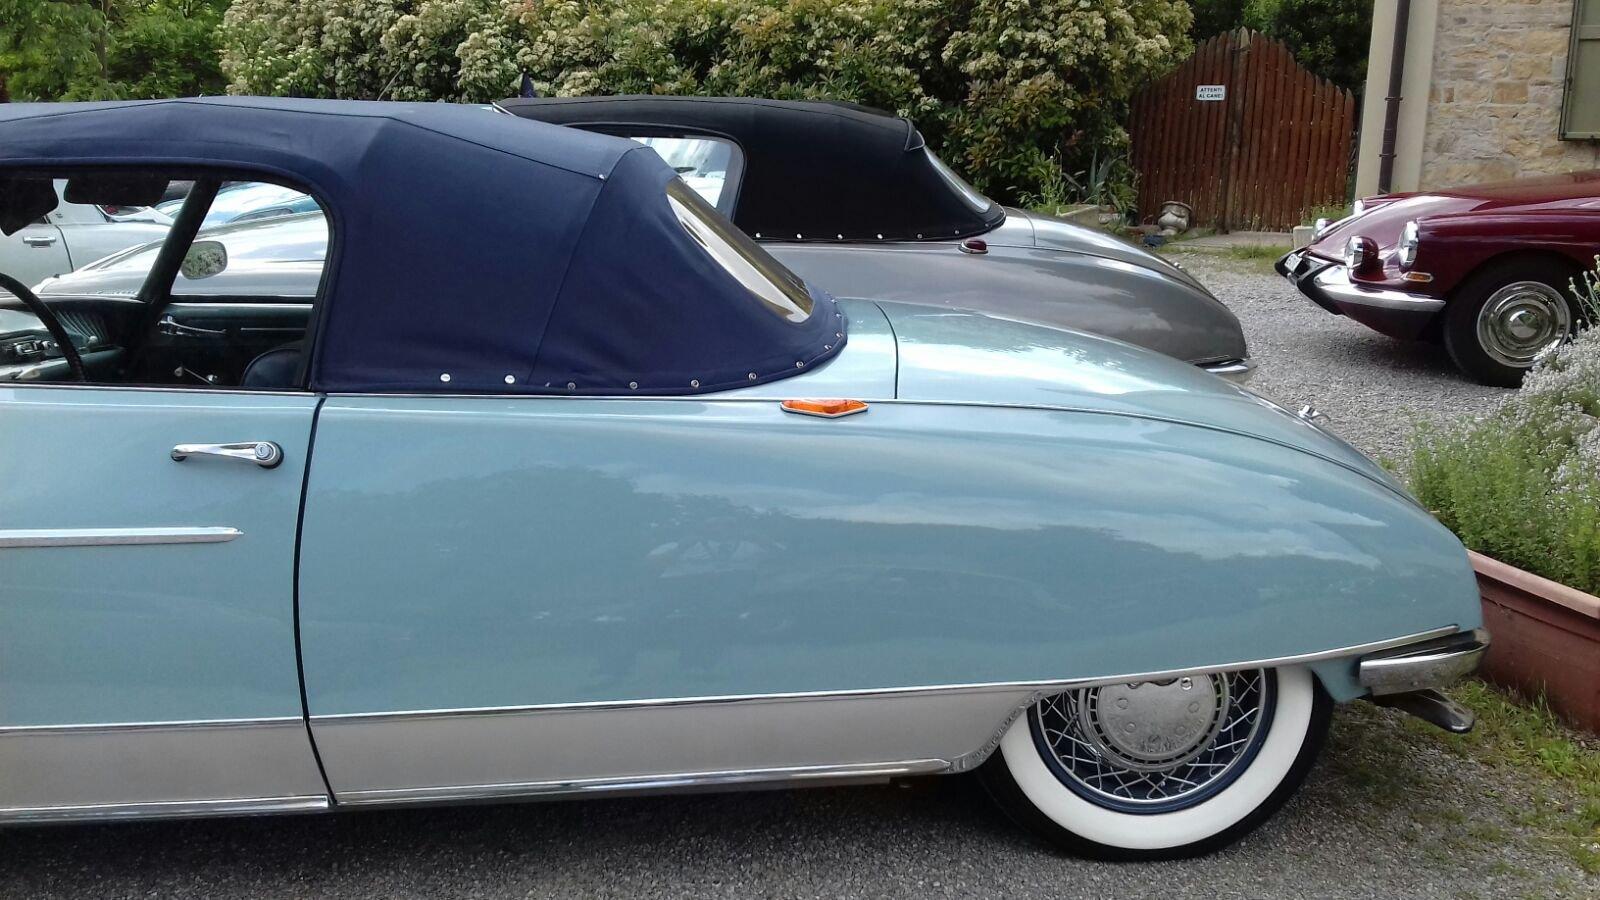 1960 Citroen ds 19 cabriolet le caddy chapron For Sale (picture 5 of 6)